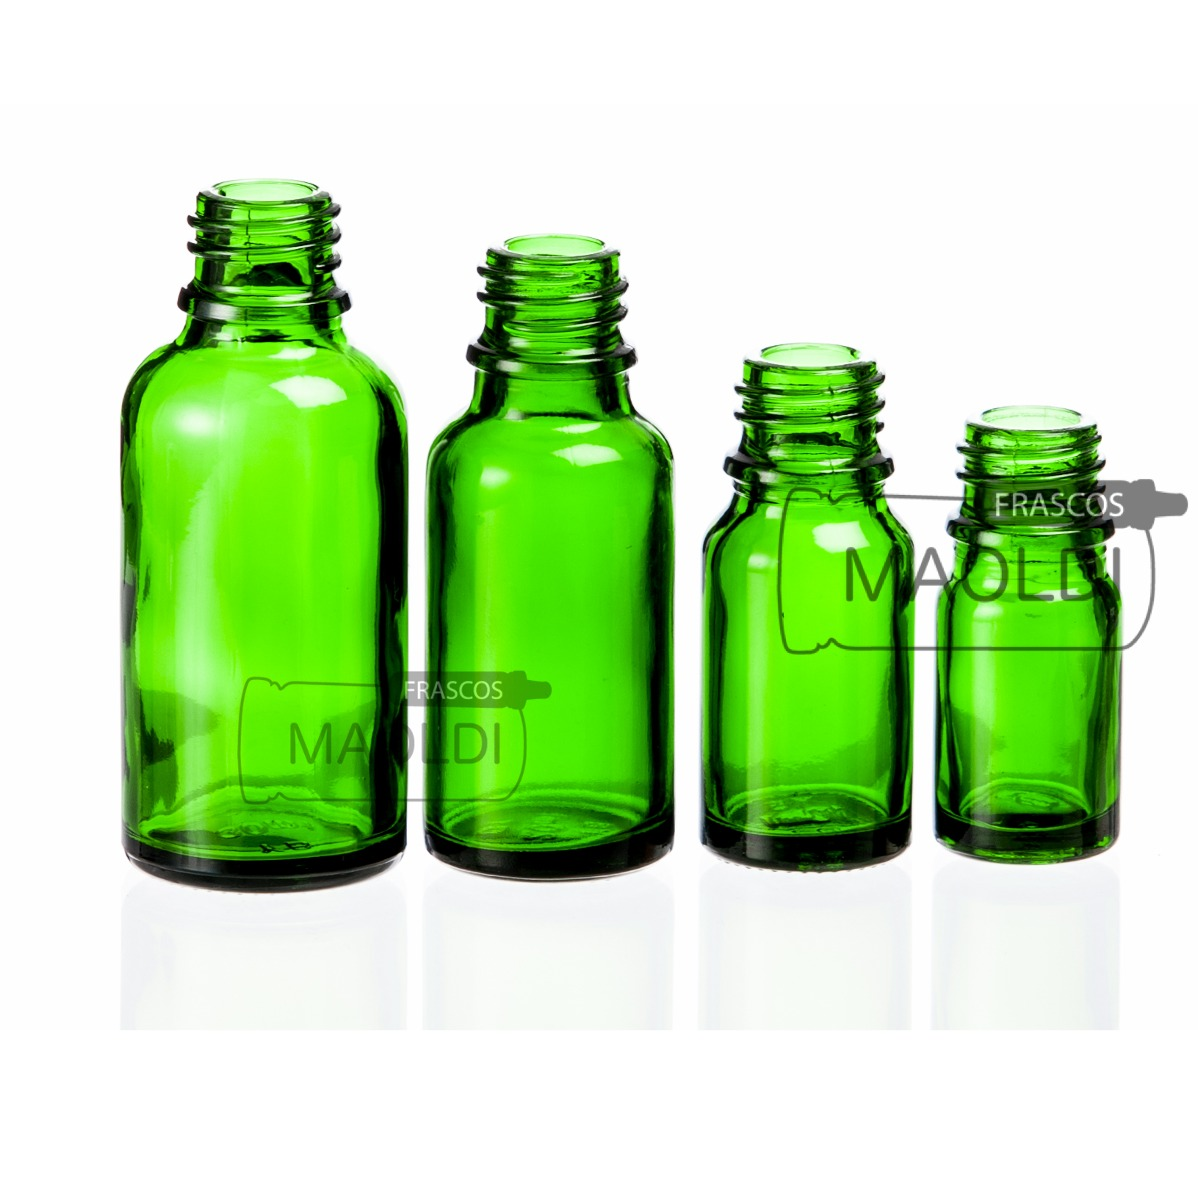 Frasco de vidrio verde 10ml 25 pzas envase gotero maoldi for Vidrio plastico transparente precio